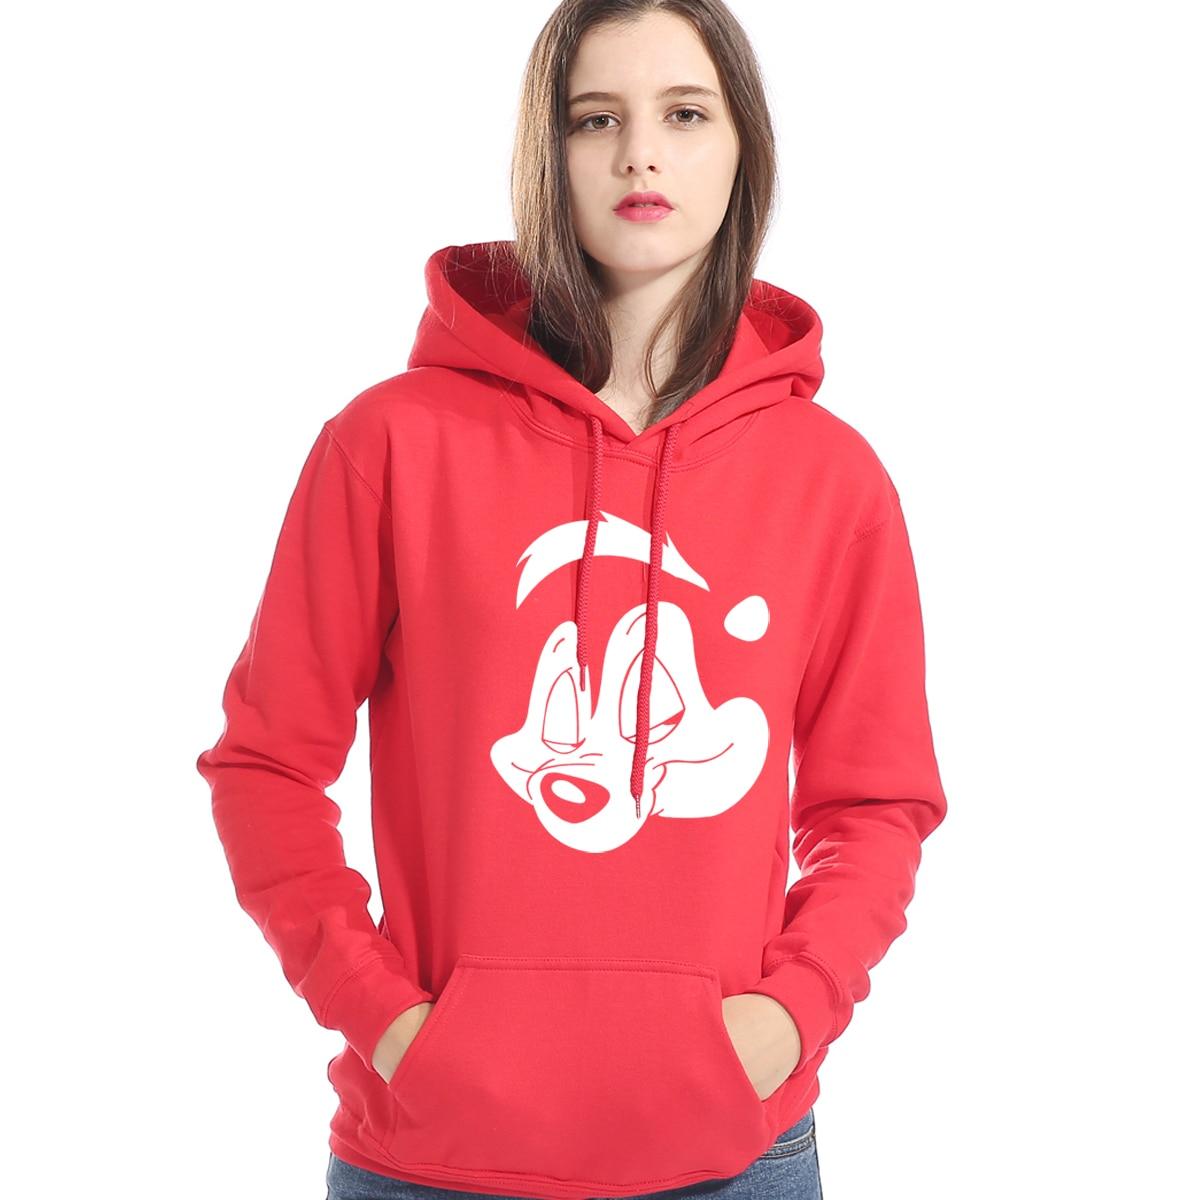 Pepe Le Pew Cartoon Print Sweatshirt For Women Hoody 2019 Autumn Winter Fleece Women's Hoodies Hip Hop Tracksuit Kawaii Hoodie